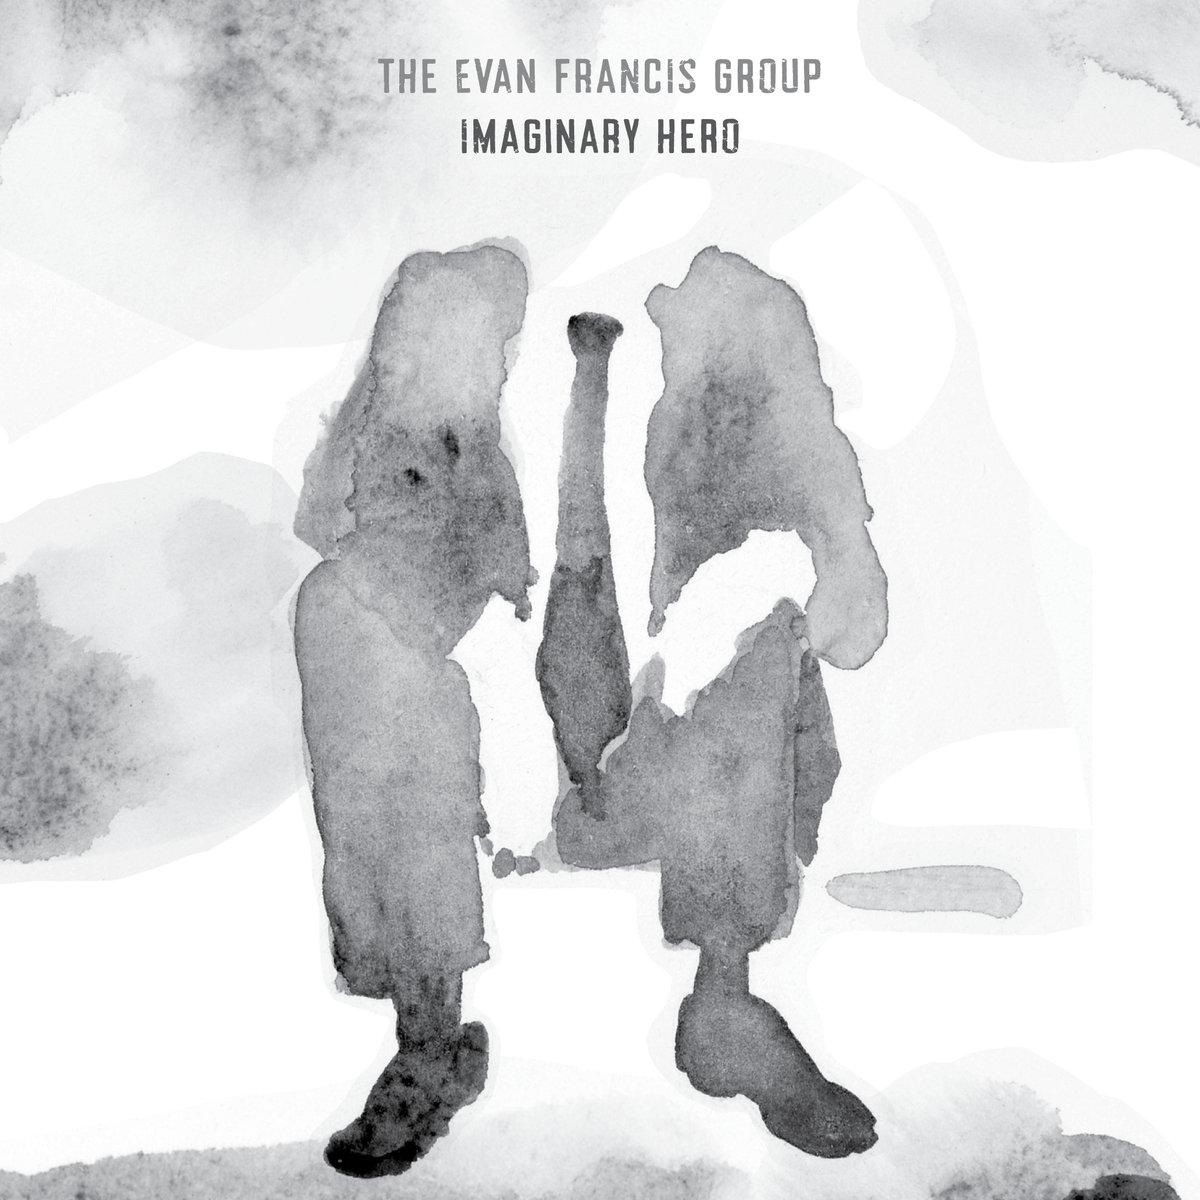 0044 The Evan Francis Group Imaginary Hero.jpg